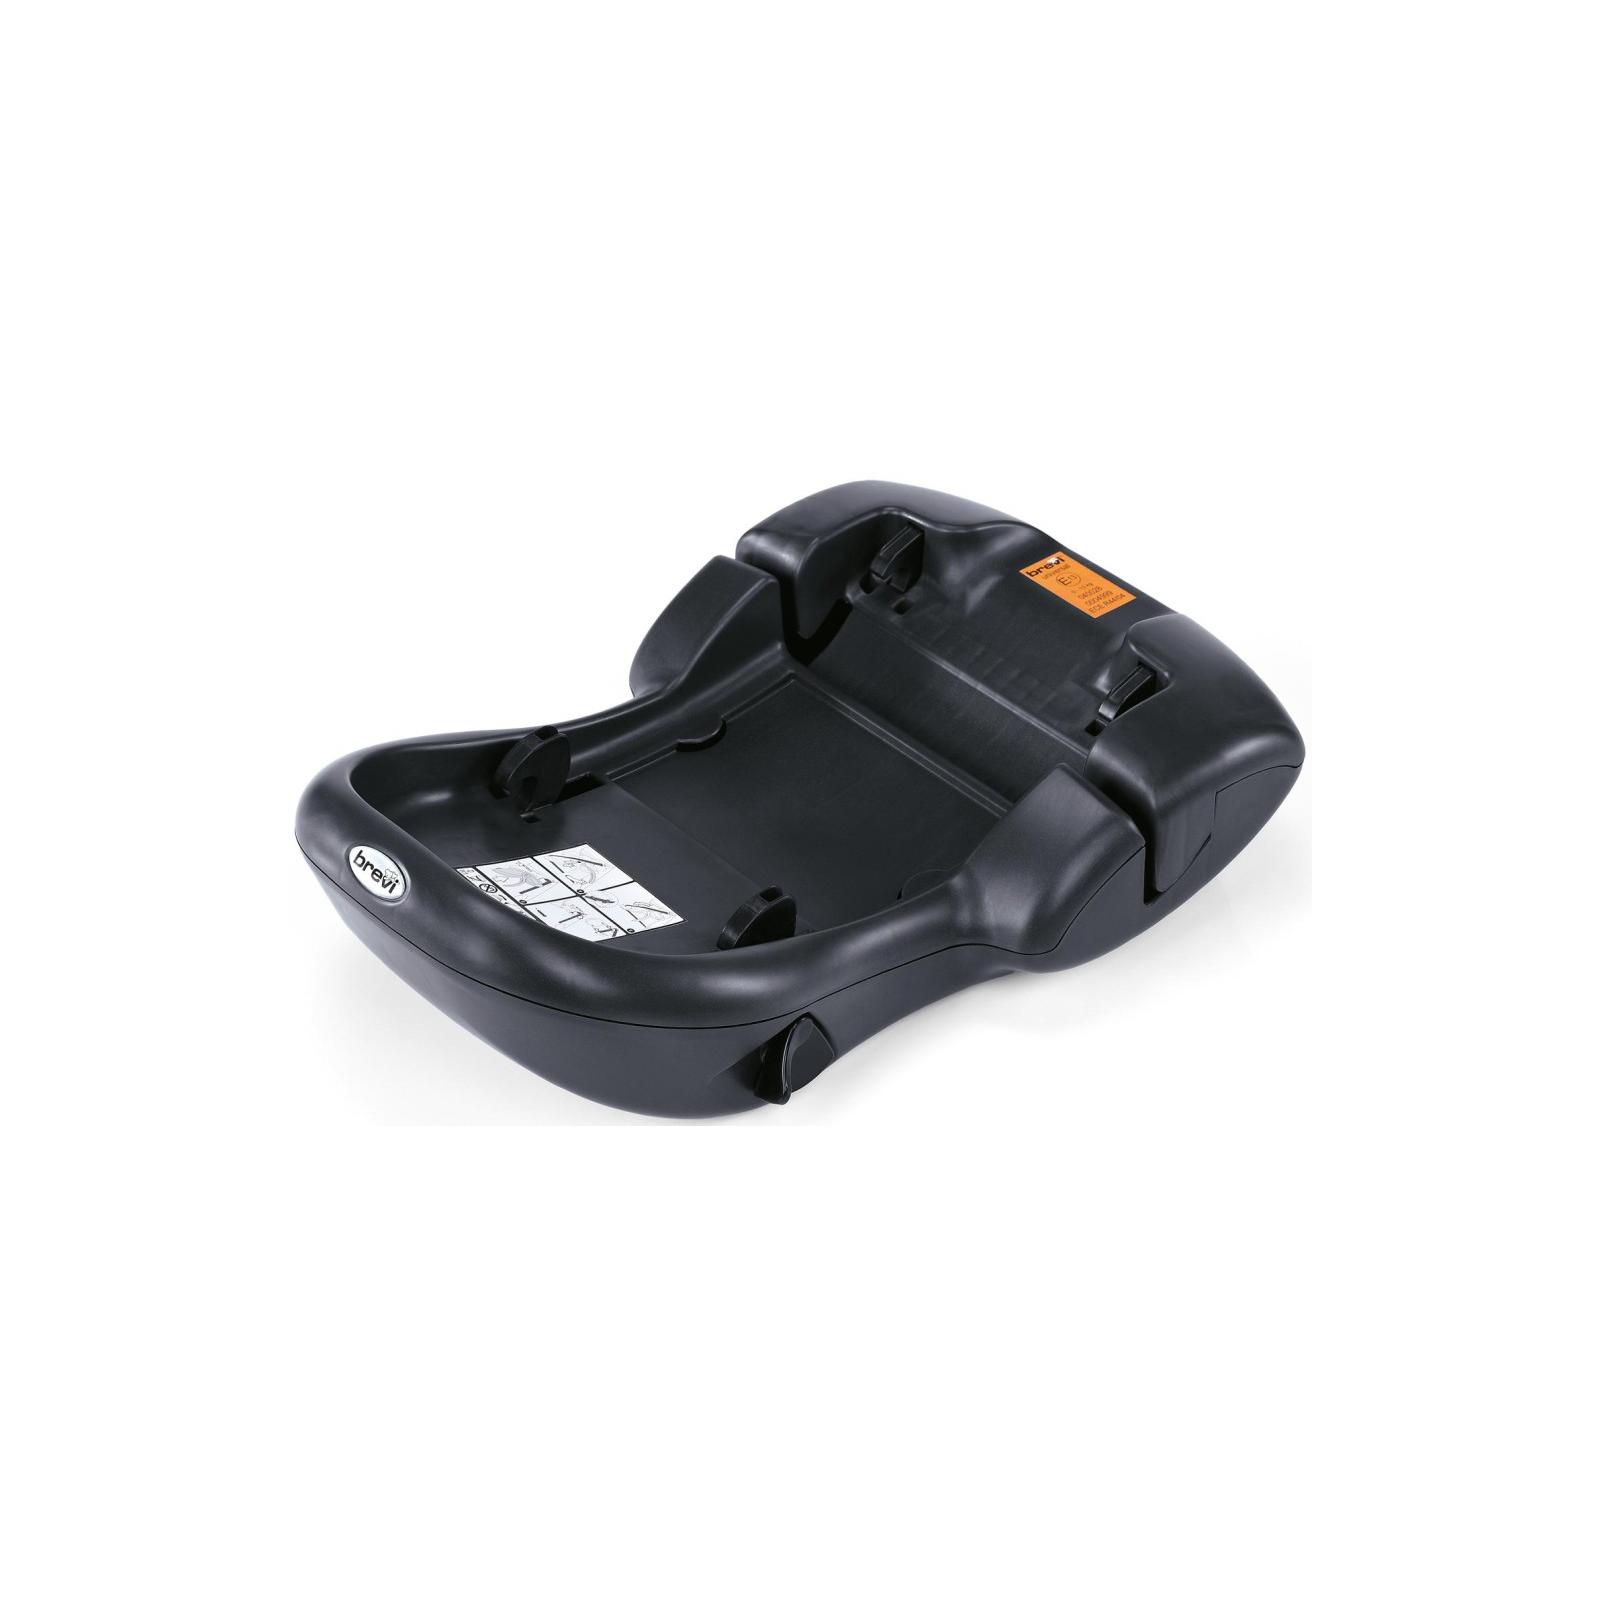 ���� Brevi ��� ���������� Smart Silverline 544